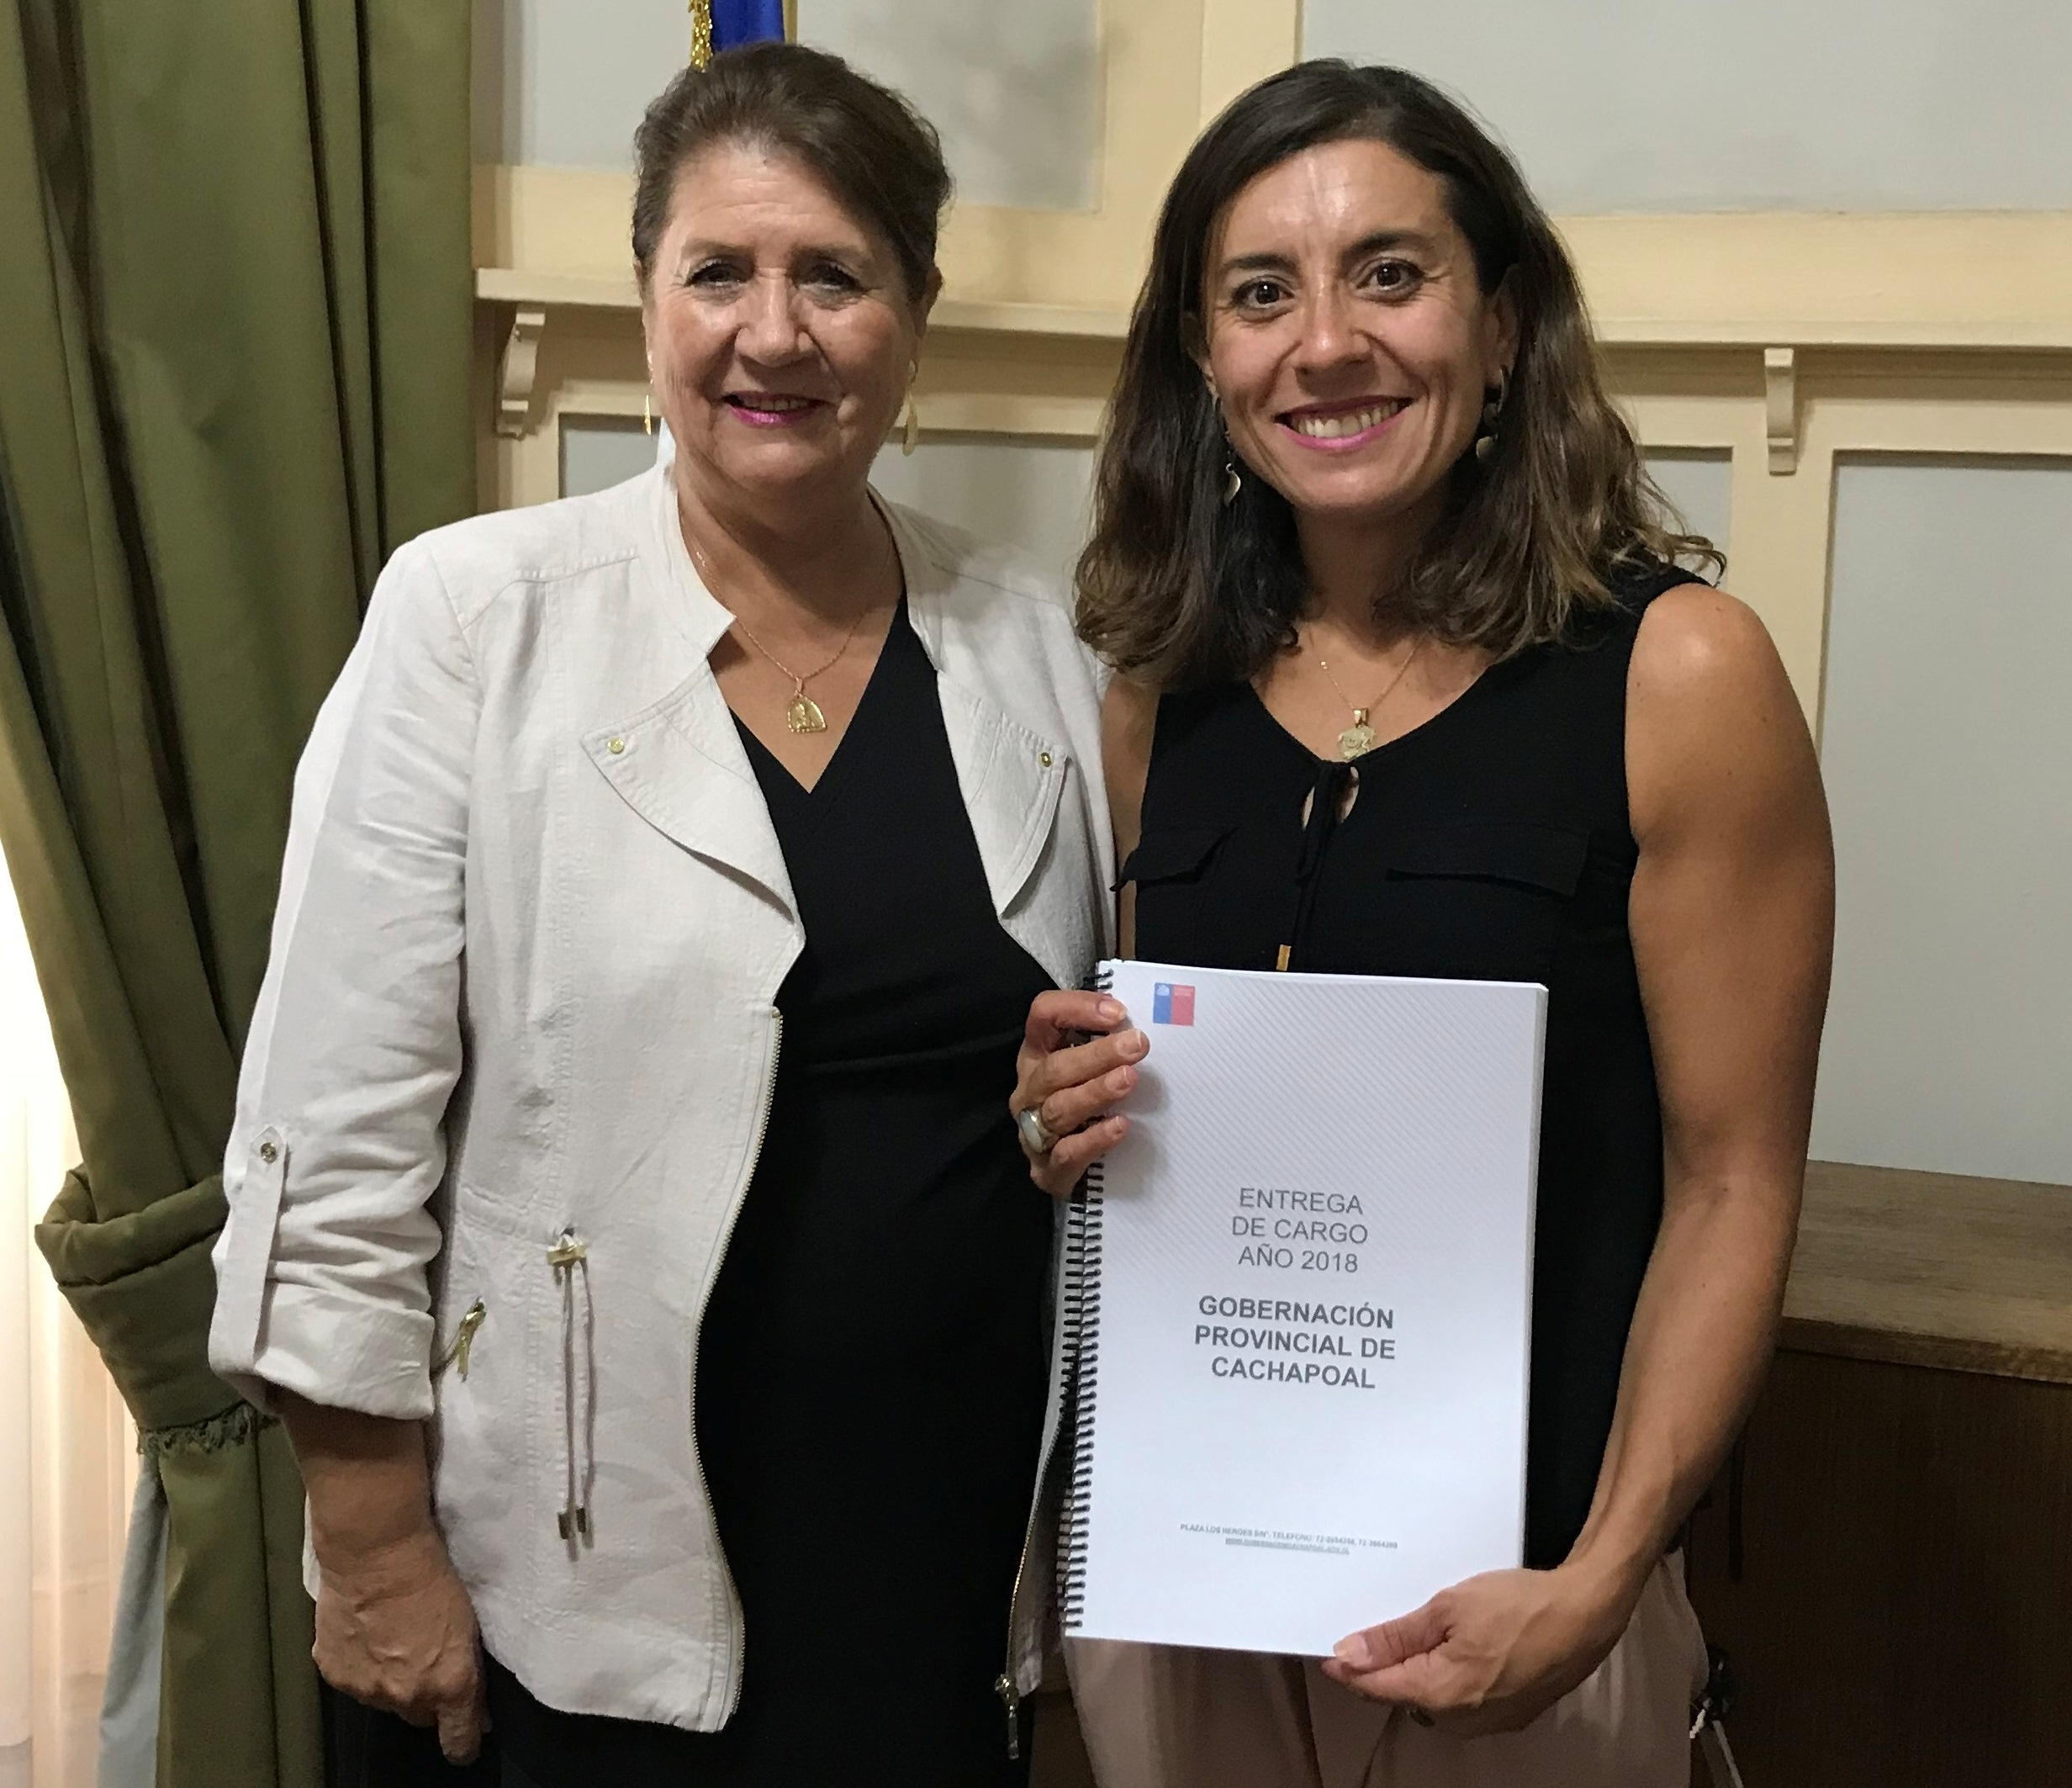 Nueva Gobernadora de Cachapoal: Ivonne Mangelsdorff asume como máxima autoridad provincial